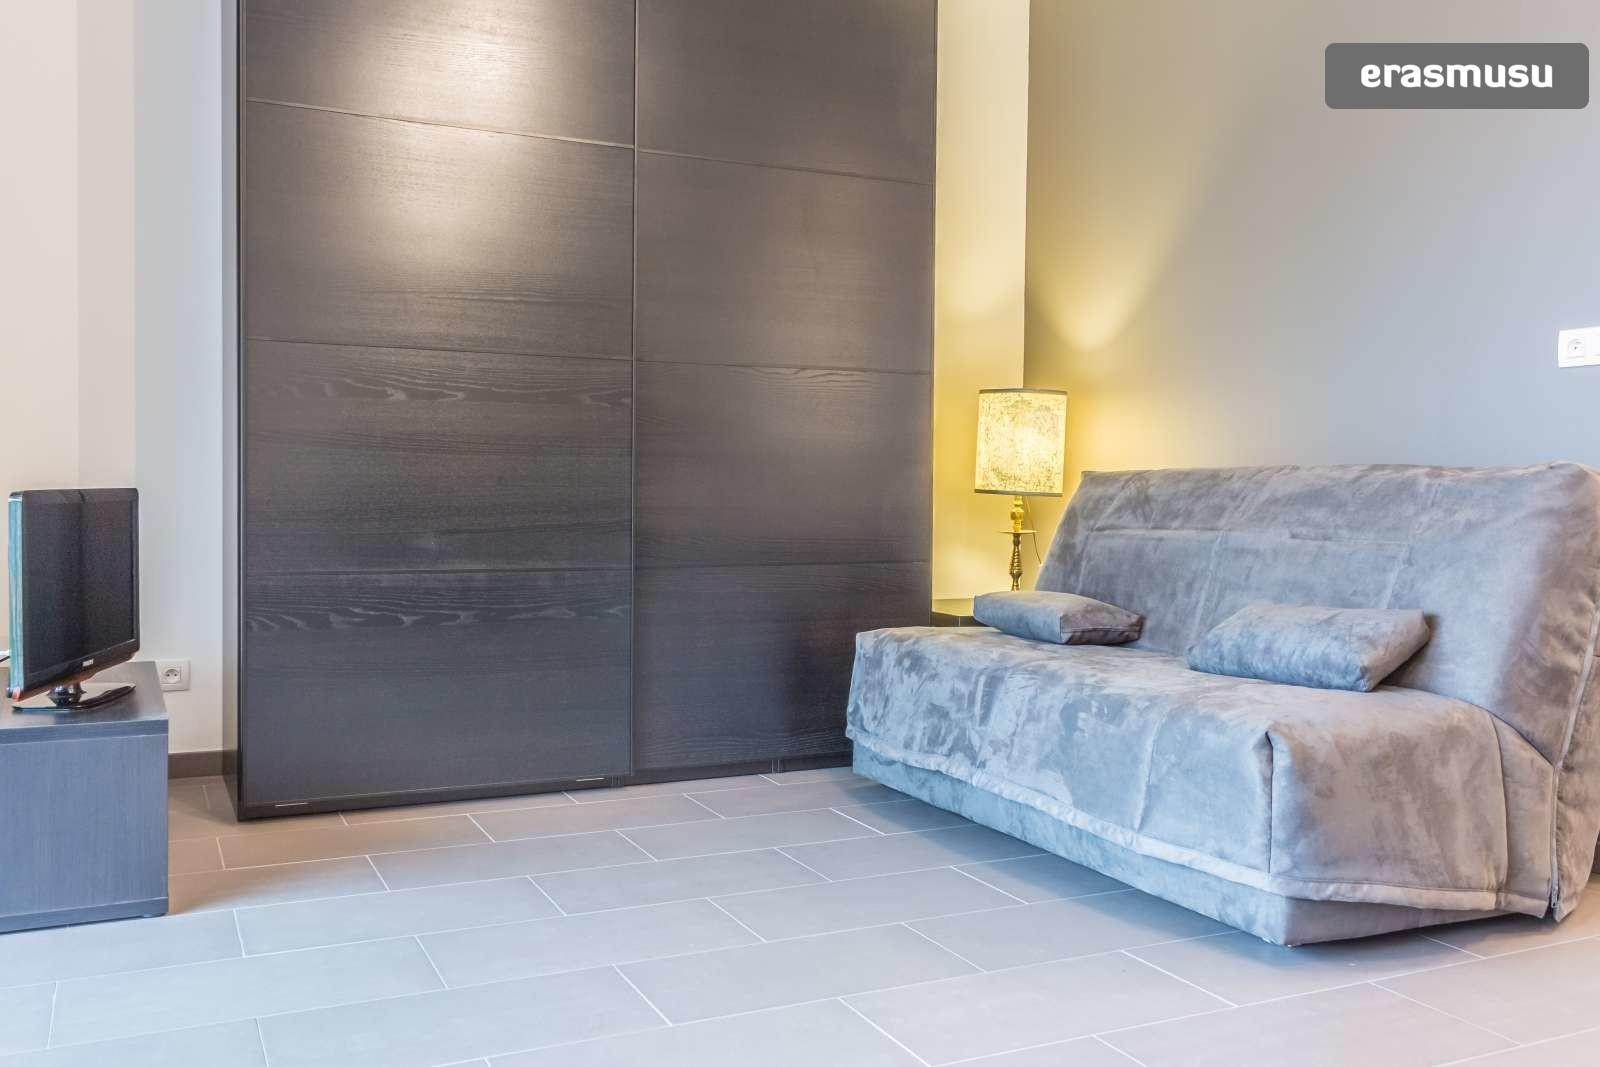 stylish-secure-studio-terrace-fourviere-hill-lyon-1509037c6821e3